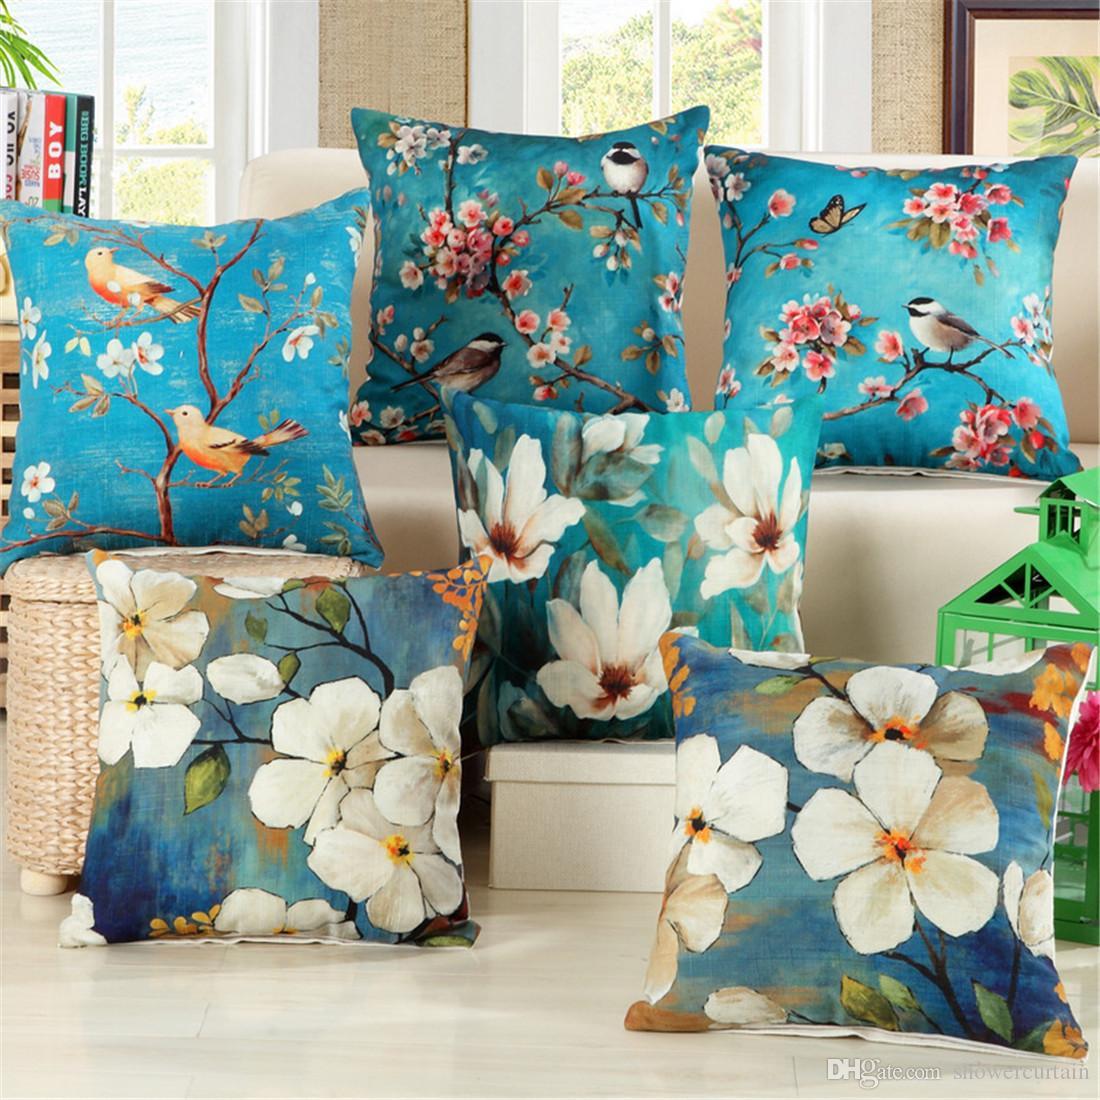 Retro Oil Painting Blue Flowers Birds Cotton Linen Throw Pillow Case